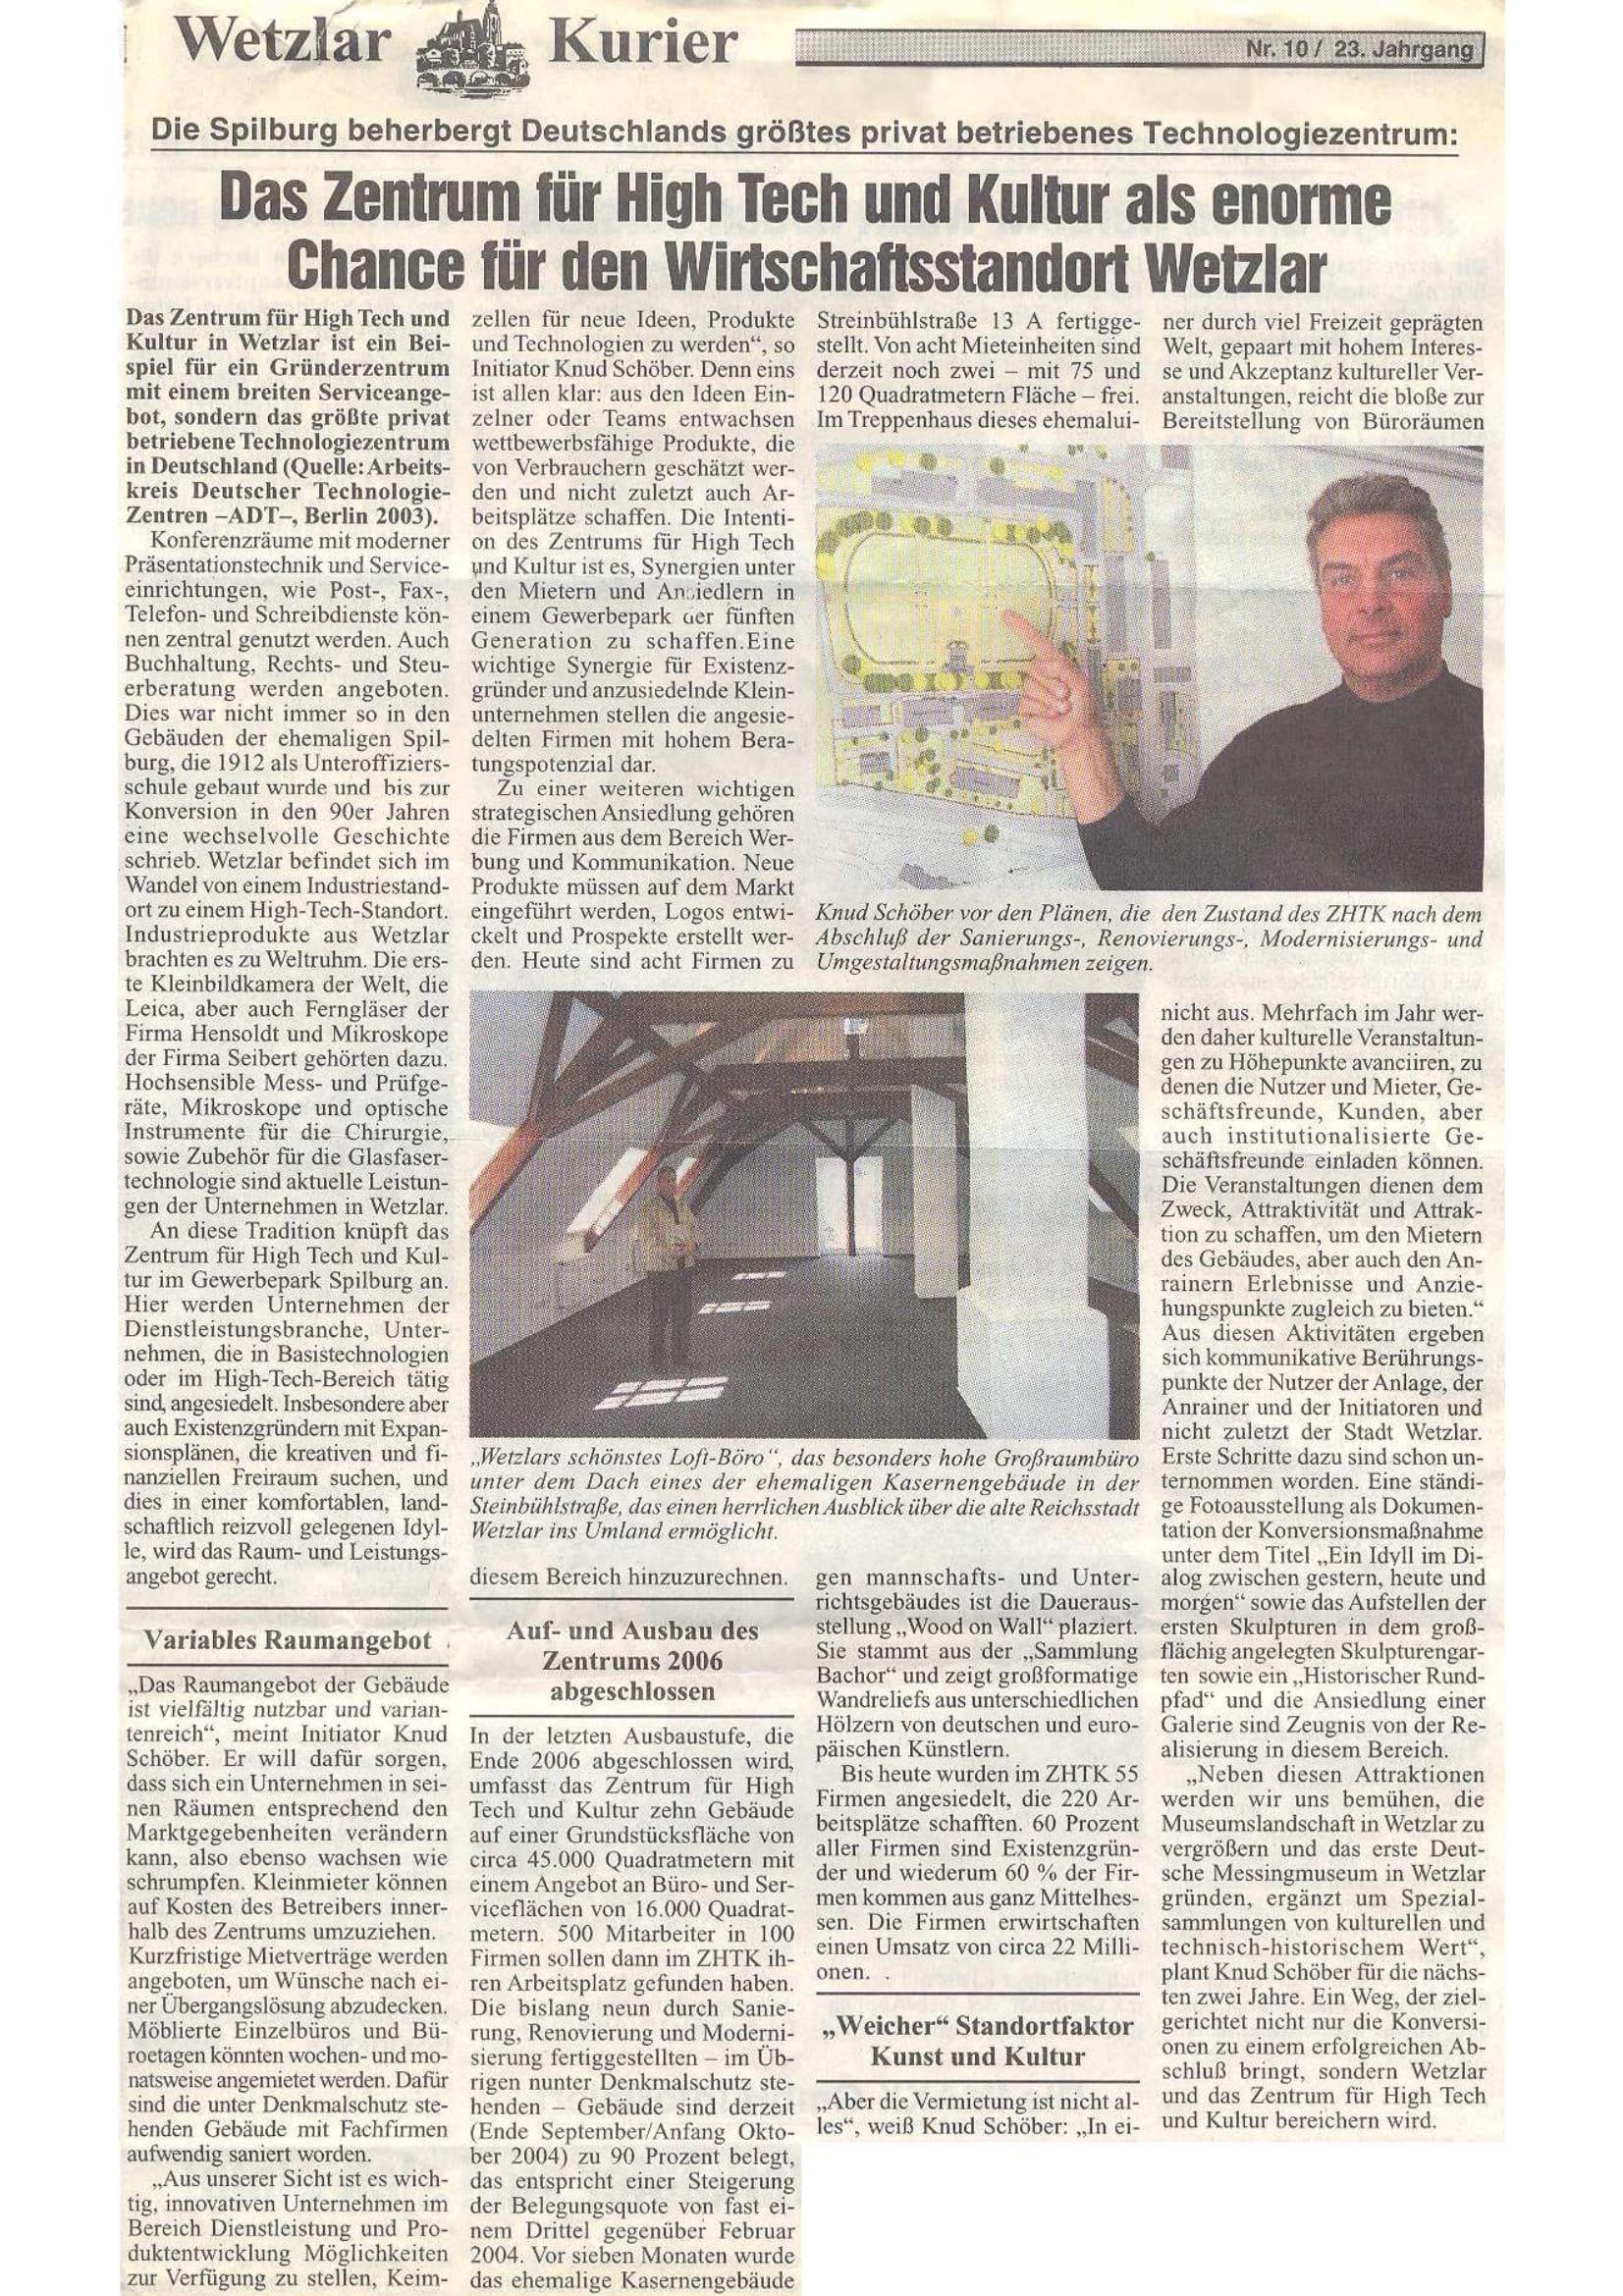 ZHTK Wetzlar Artikel